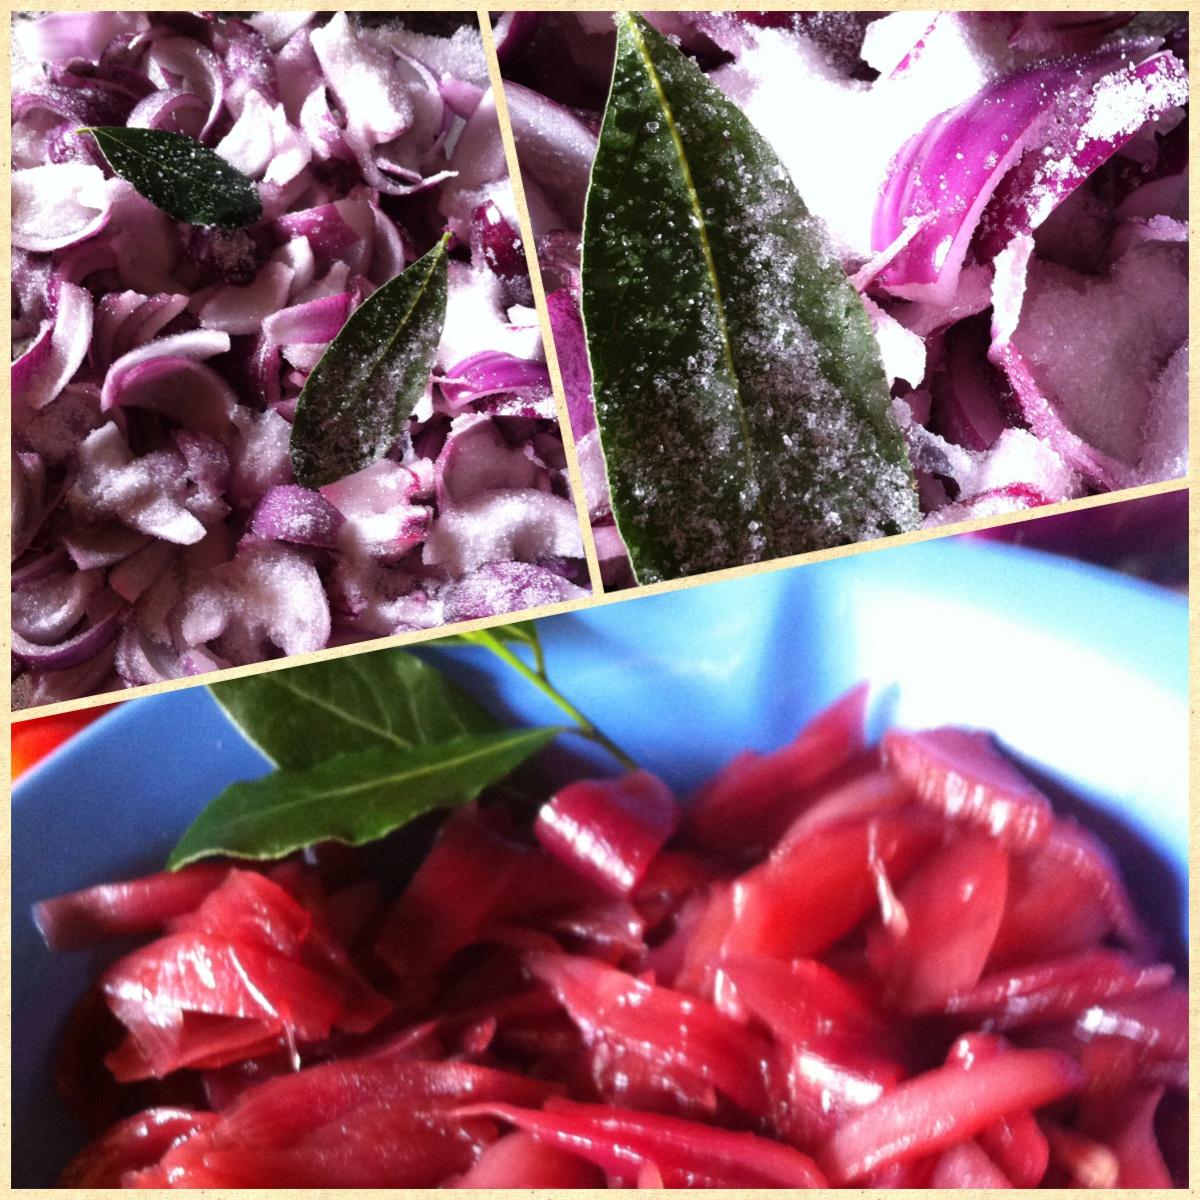 cipolle-marinate-allaceto.JPG